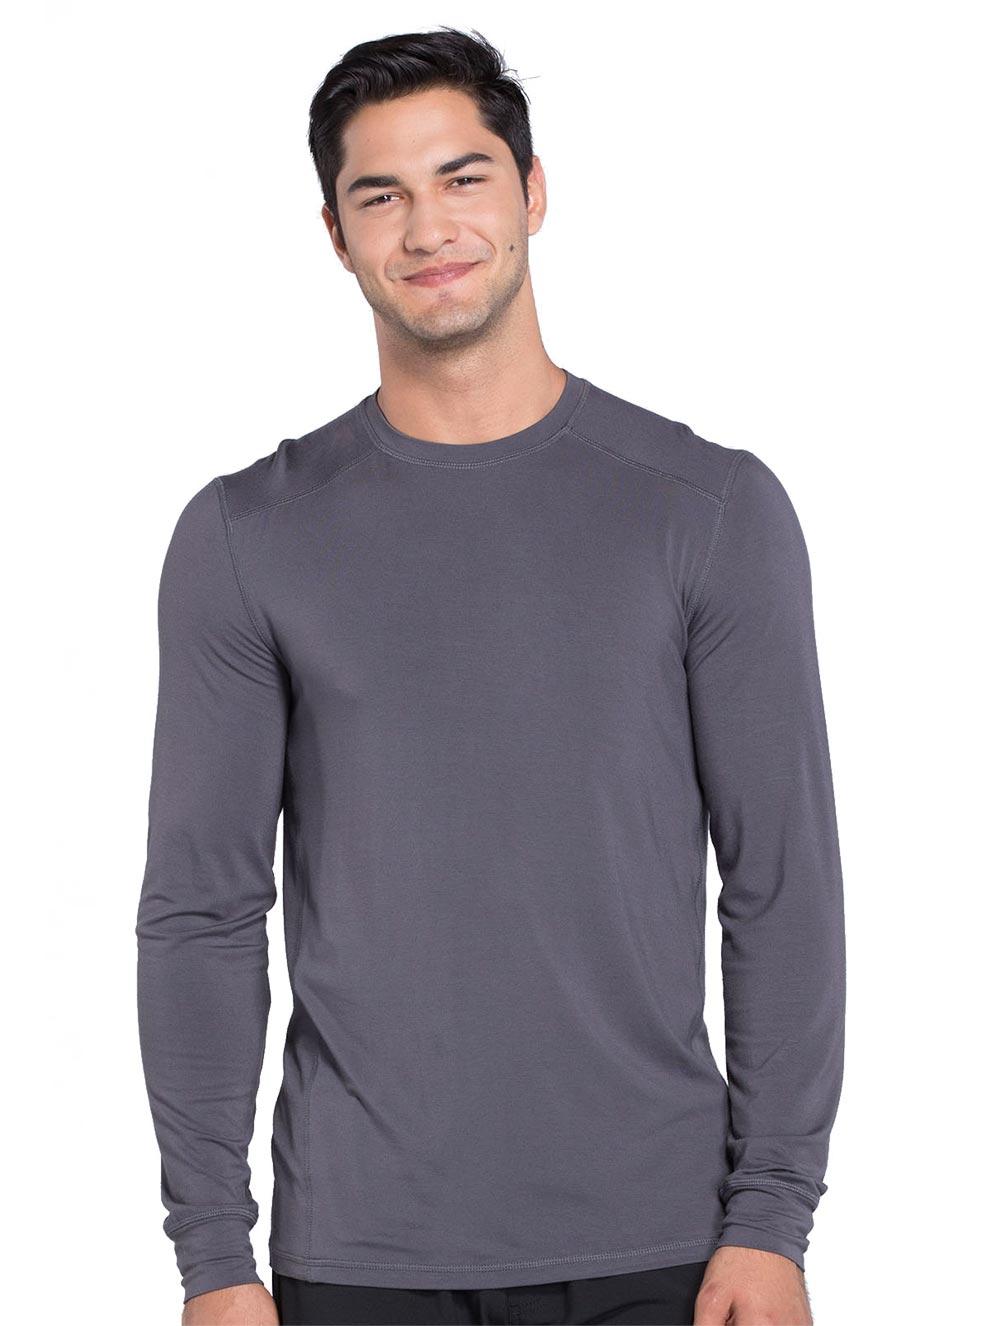 Men's Long Sleeve Underscrub Knit Top